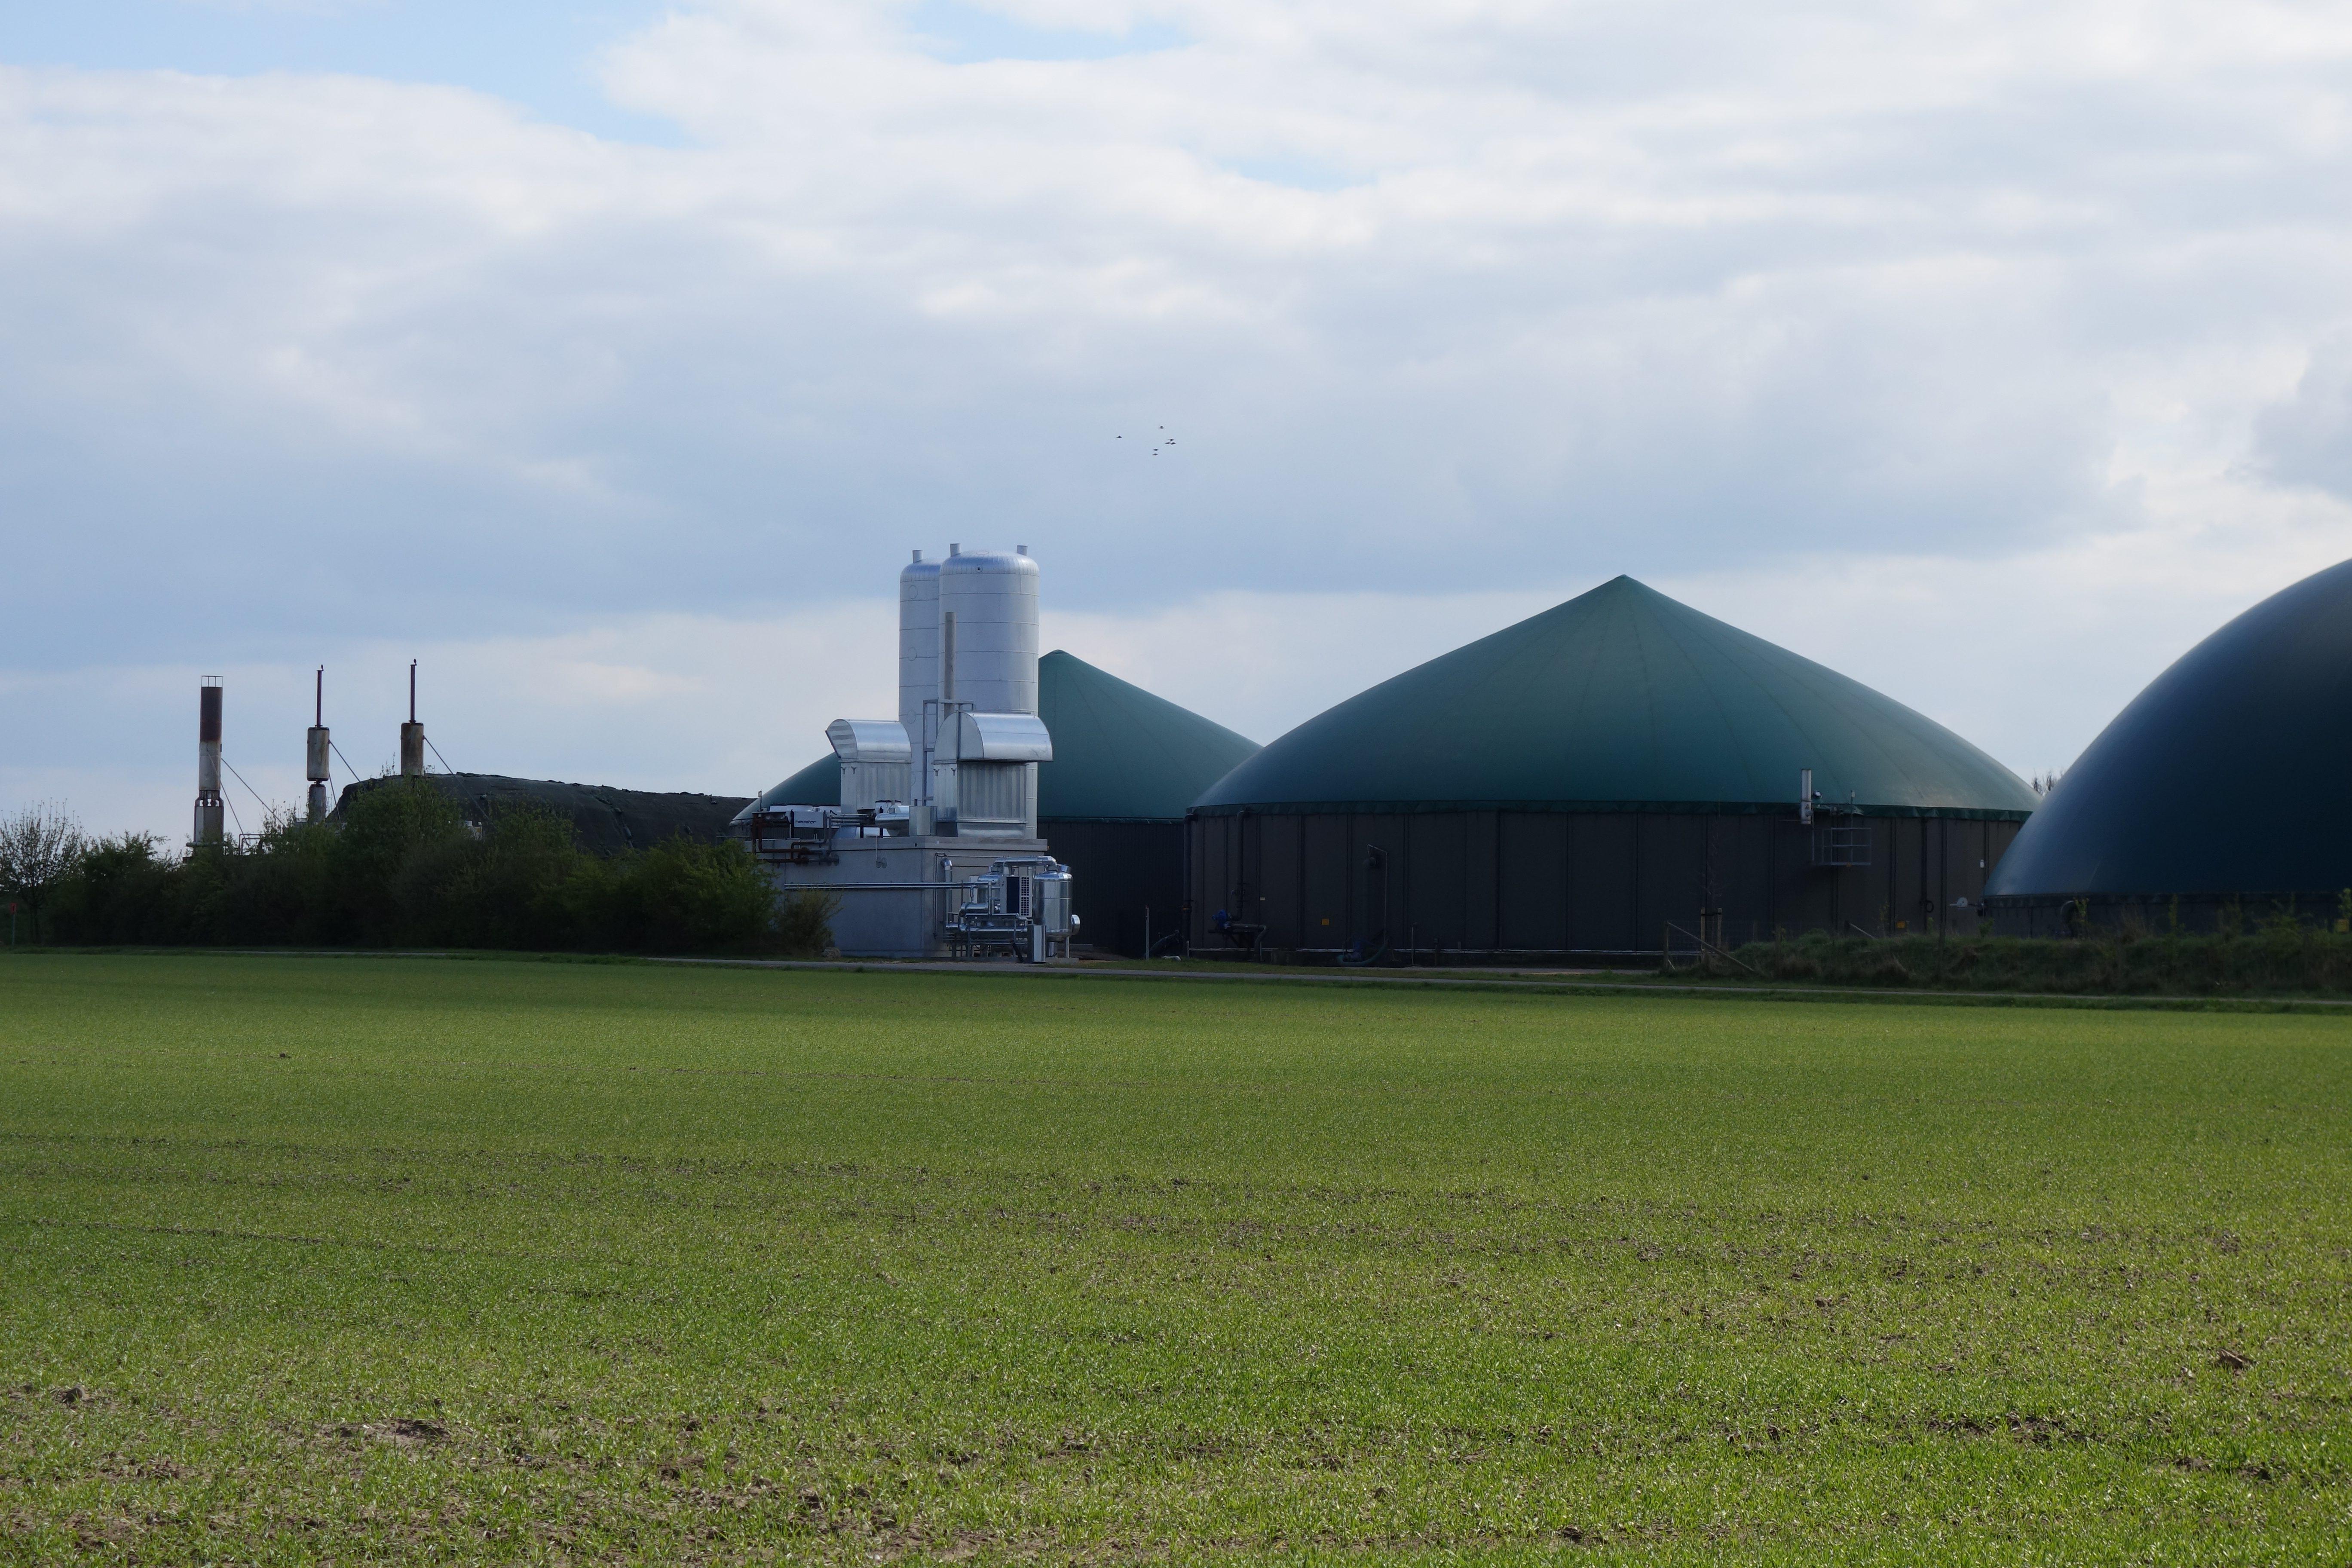 http://www.eeggmbh.com/wp-content/uploads/panorama/biomassekraftwerk_tour.htm